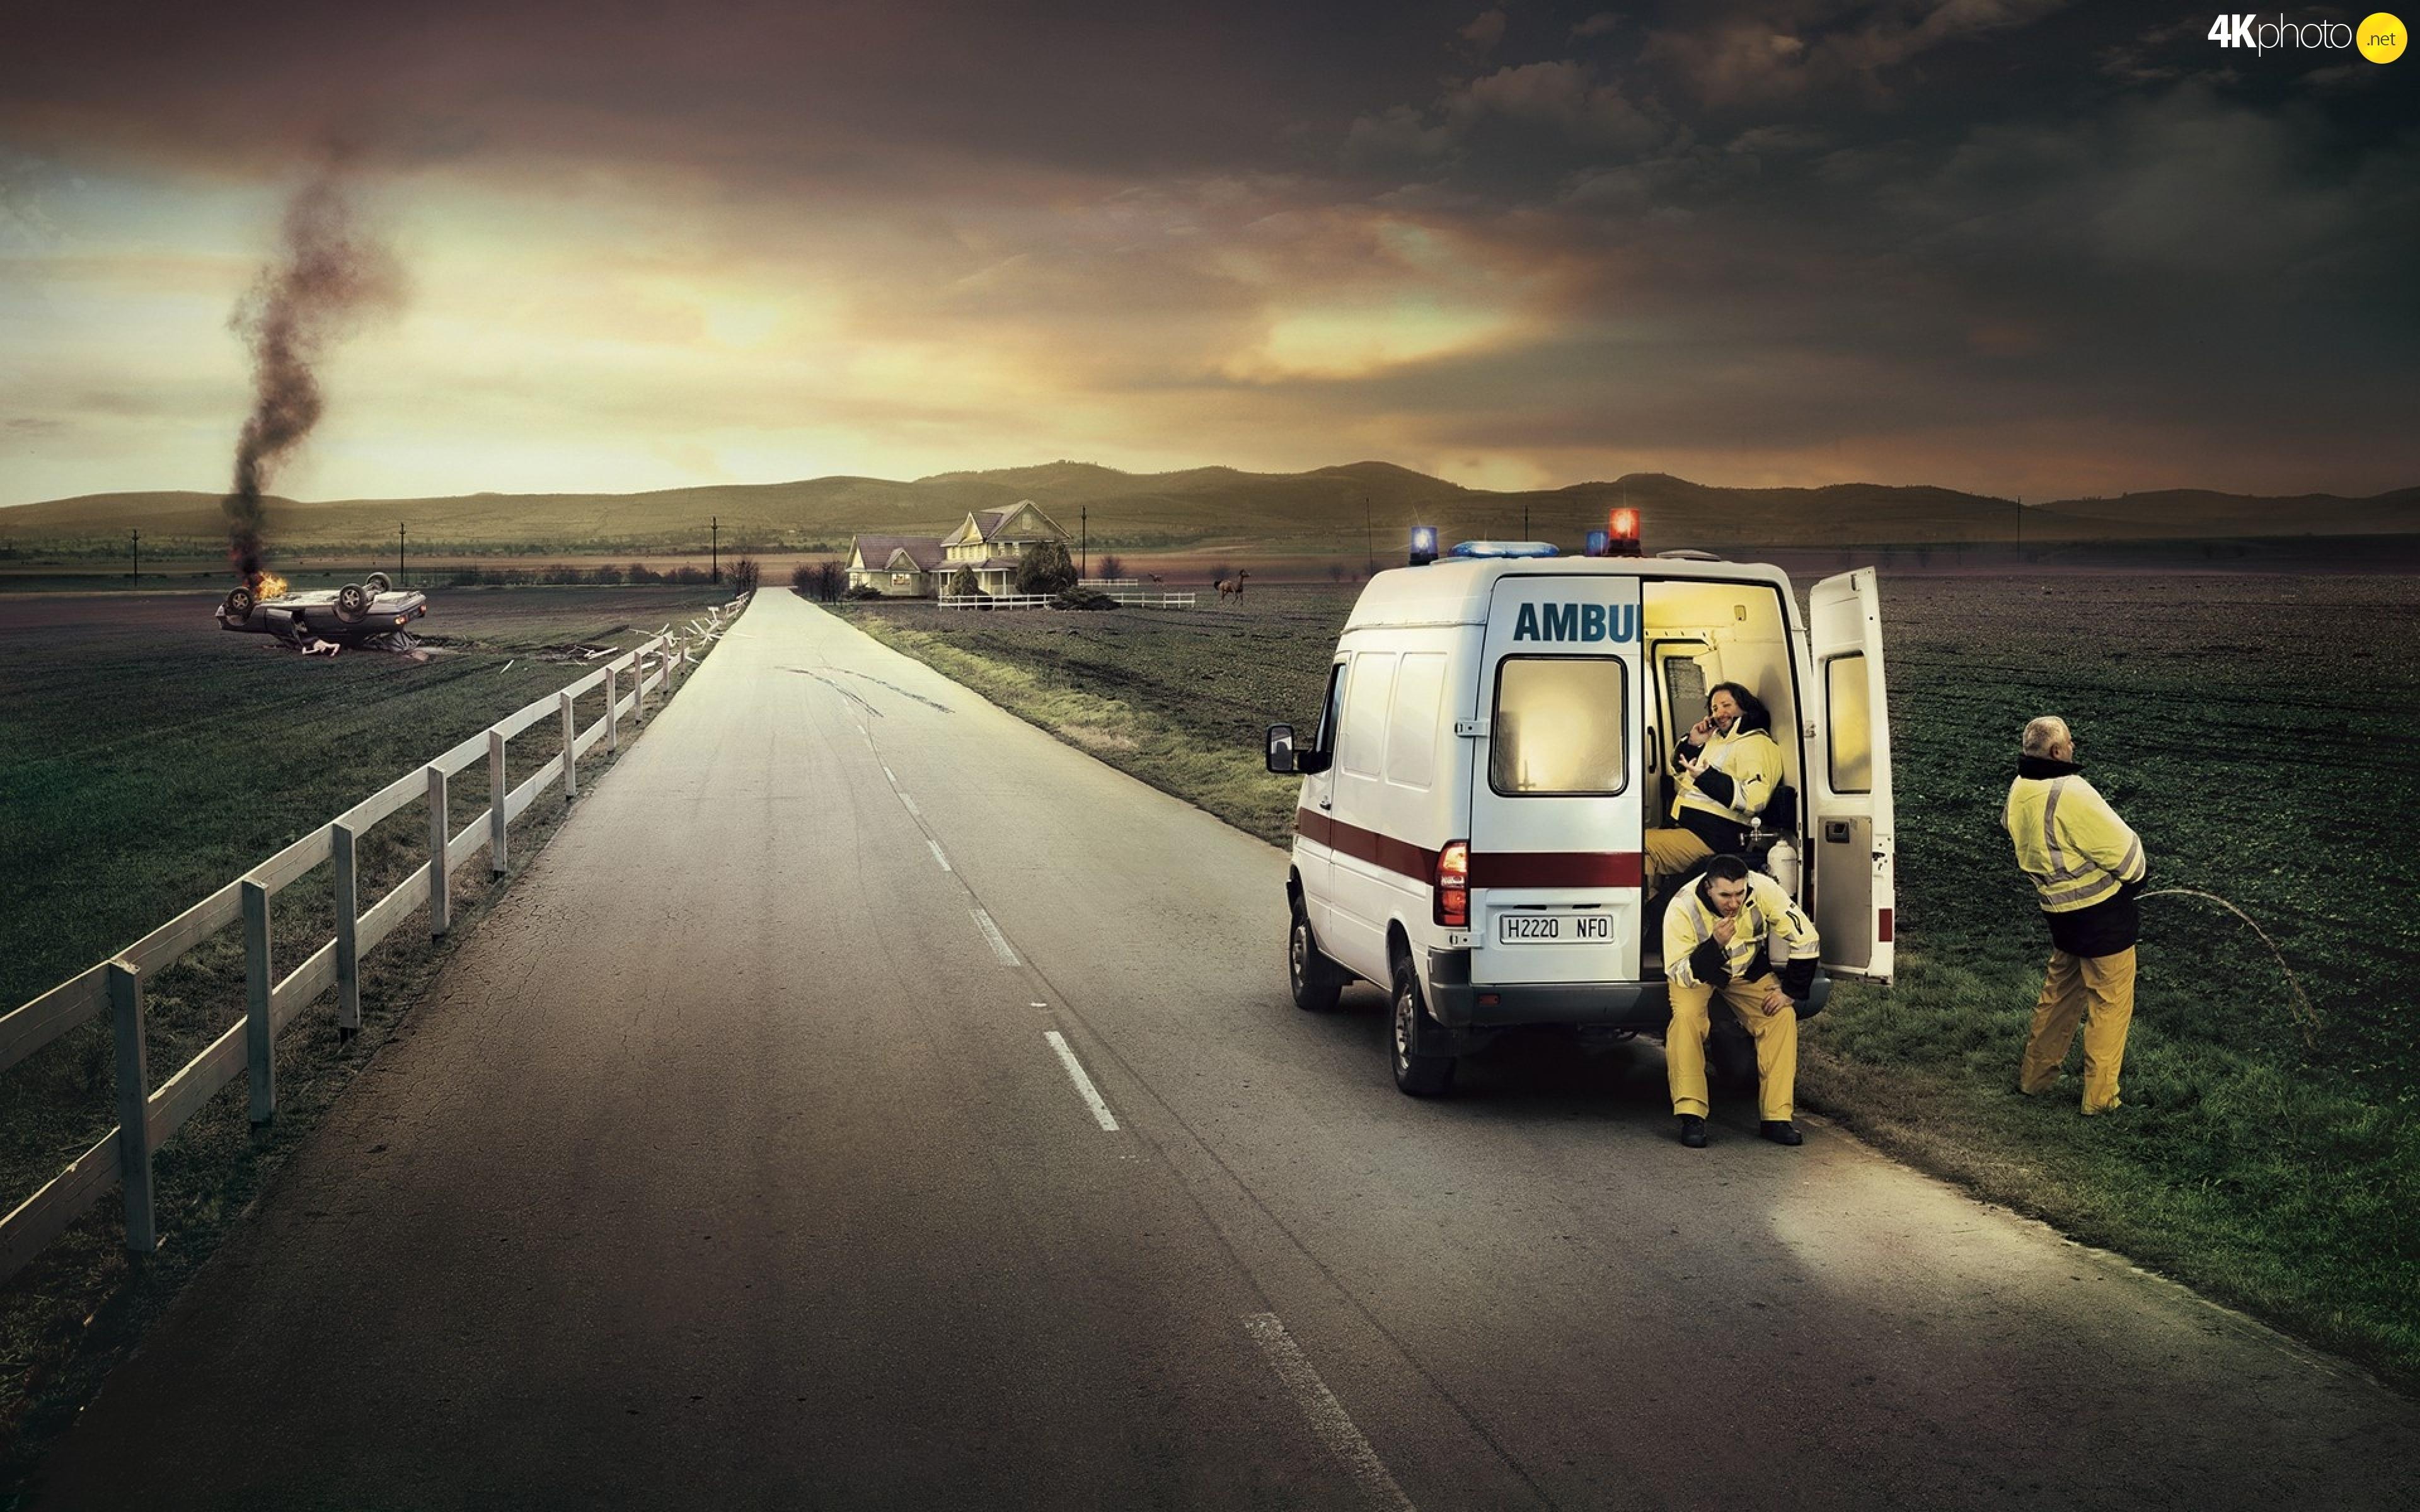 way-burning-automobile-paramedics-ambulance